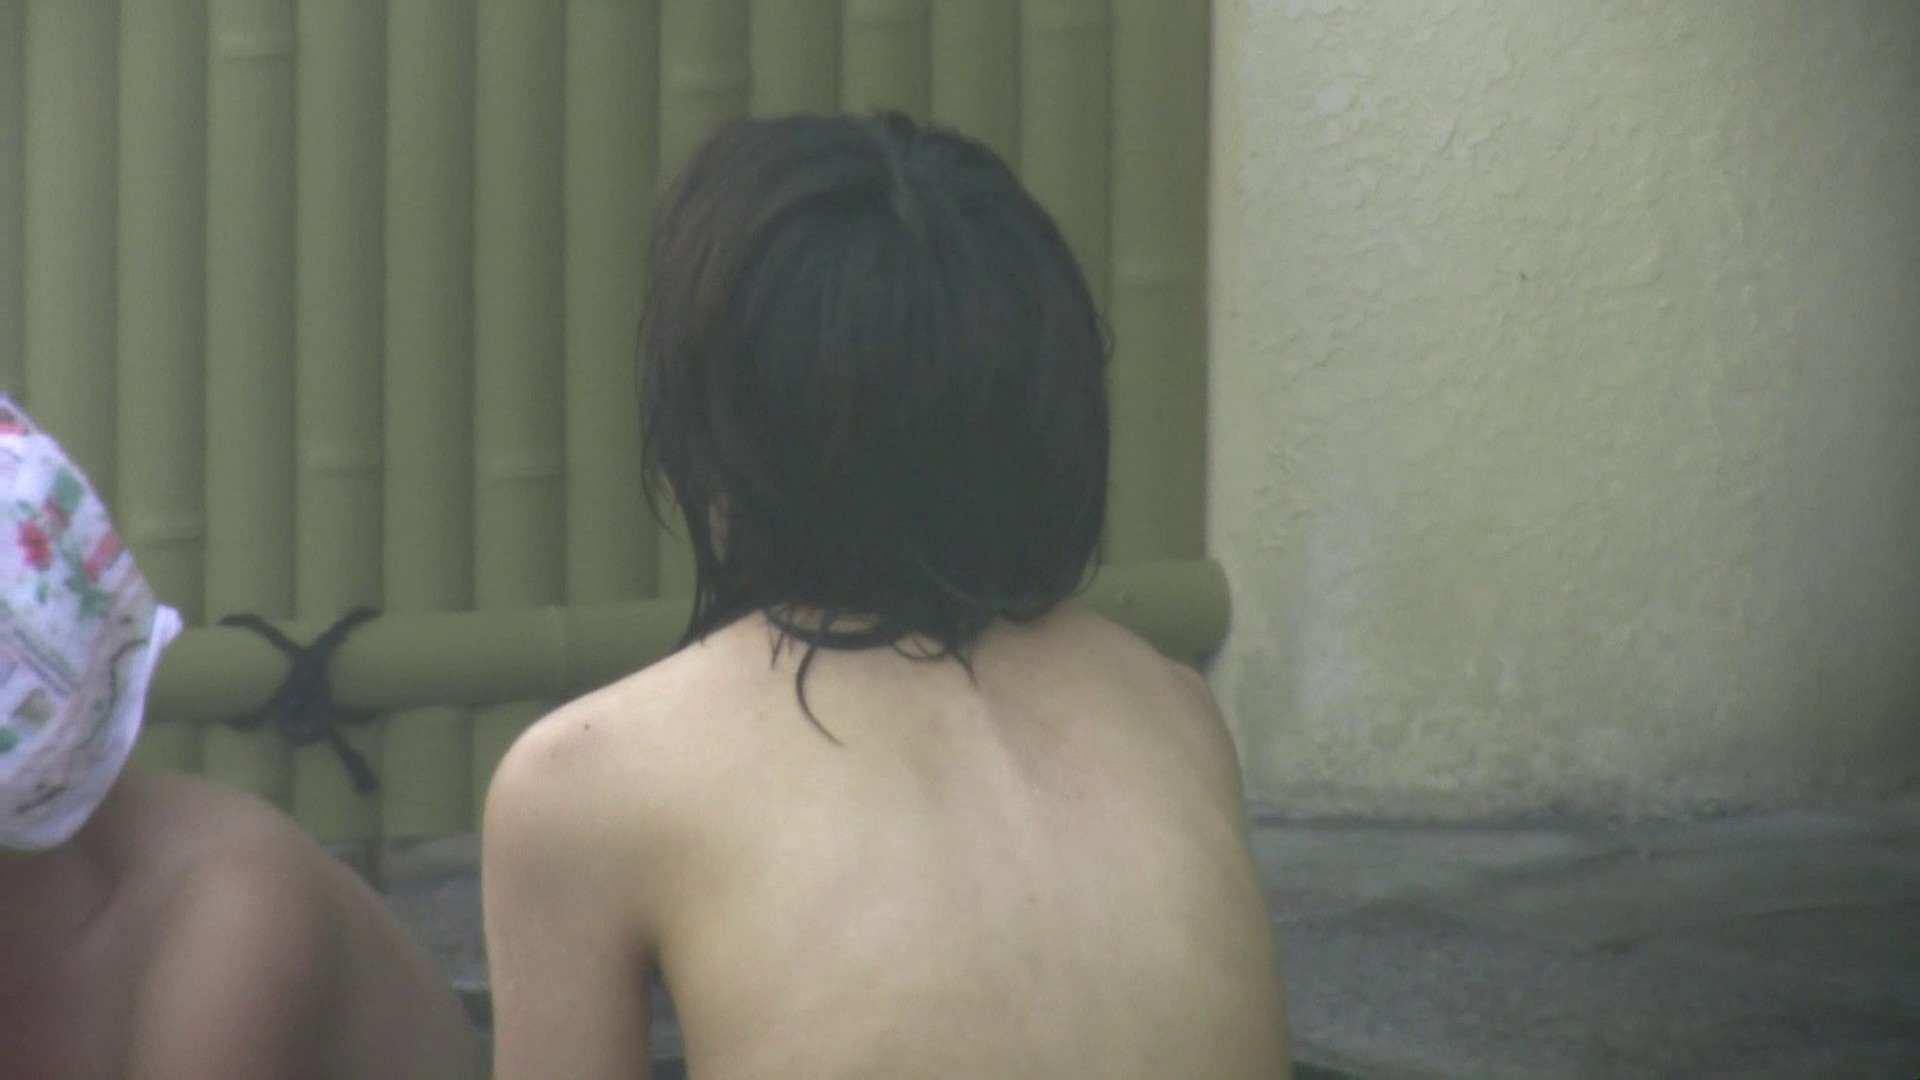 Aquaな露天風呂Vol.583 美しいOLの裸体 すけべAV動画紹介 103pic 89